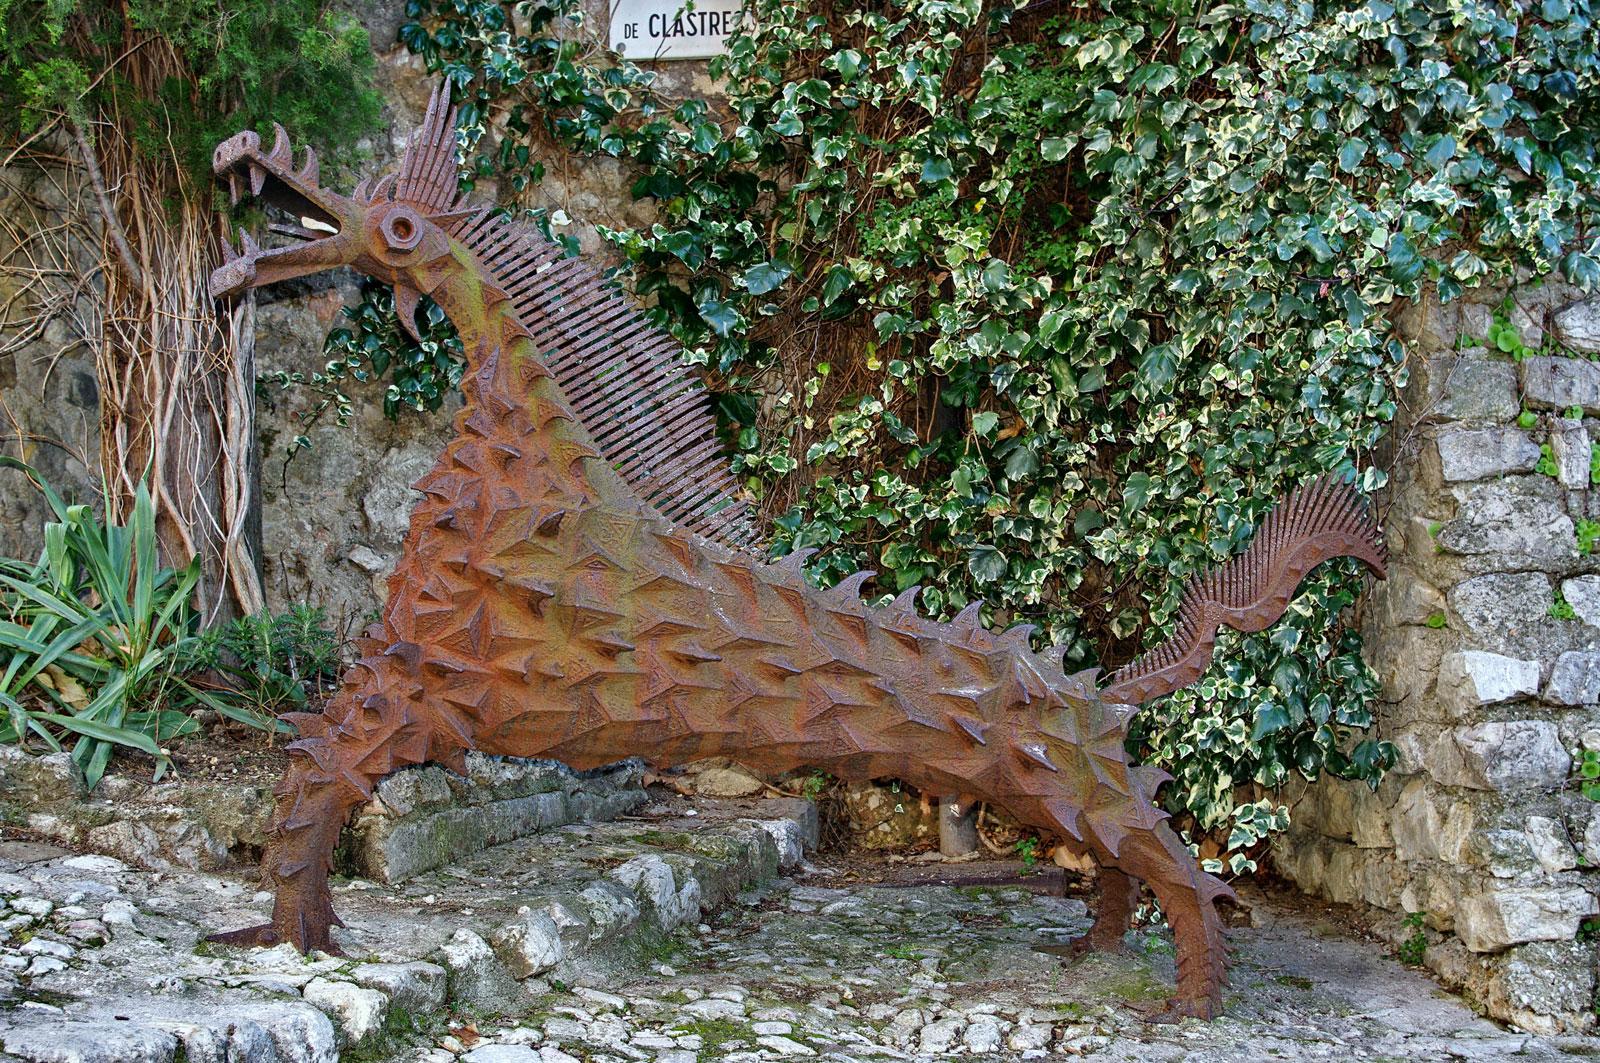 Le Dragon d'Ivanoff